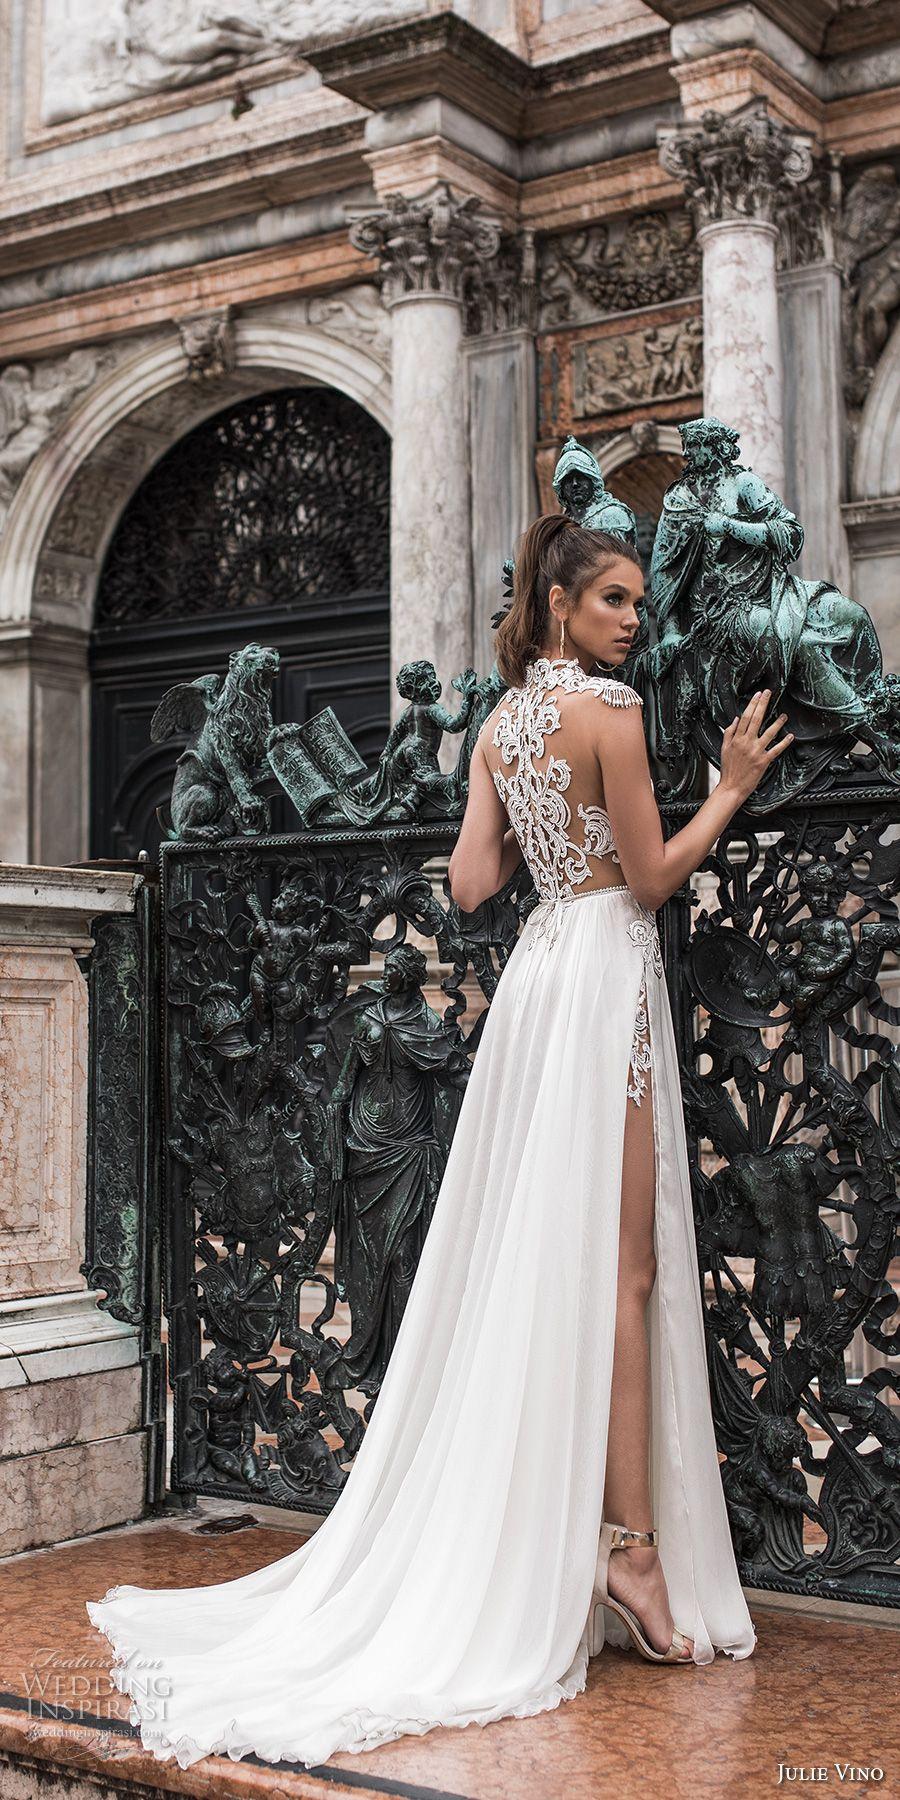 Julie vino spring wedding dresses u ucveneziaud bridal collection